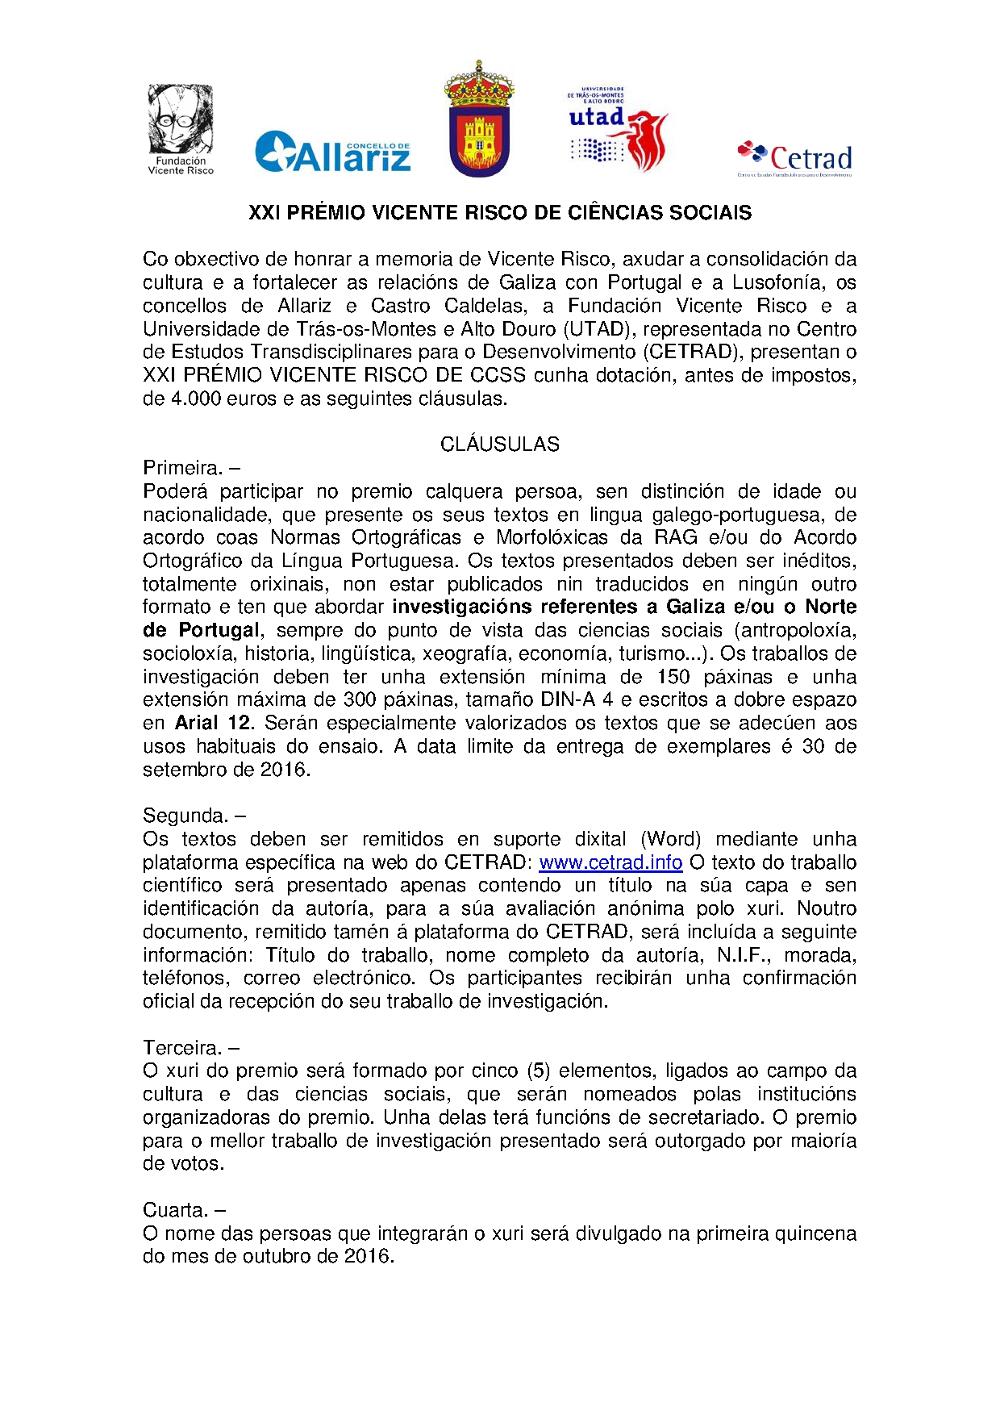 XXI Premio Vicente Risco Ciencias Sociais 2016 2